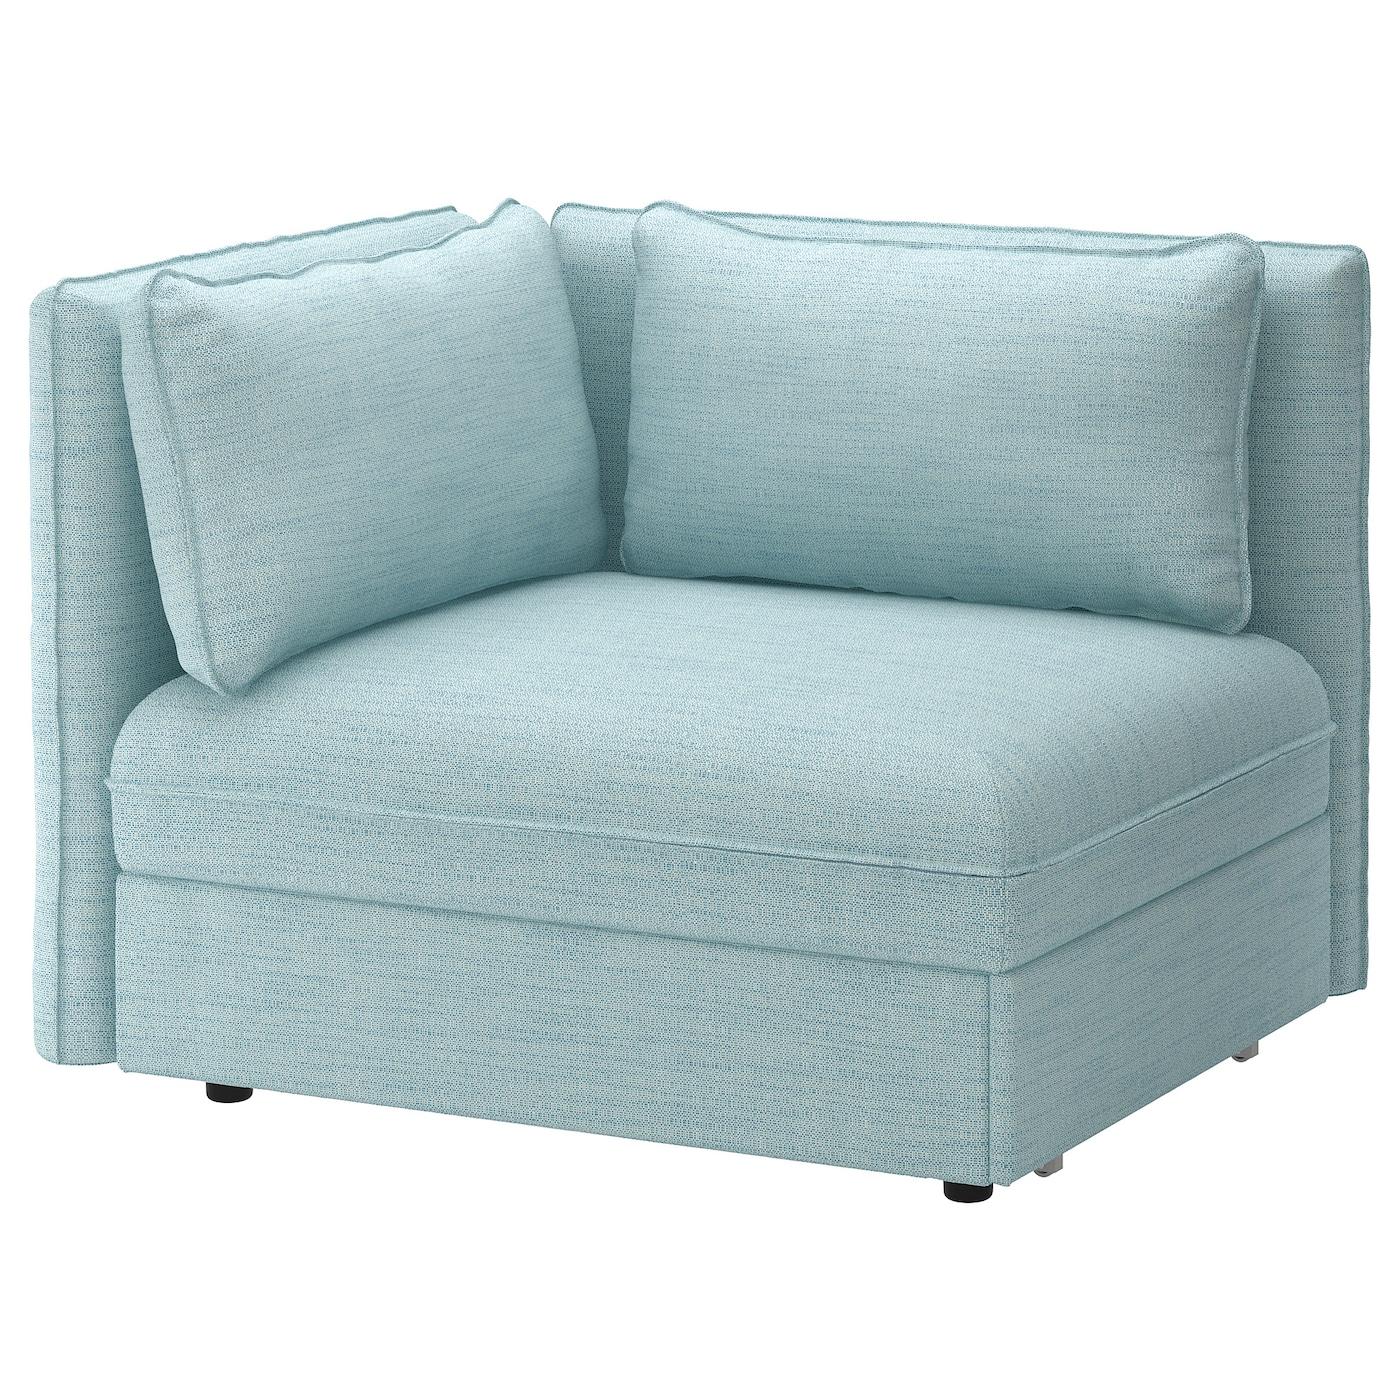 Vallentuna Module Convertible Avec Dossiers Hillared Bleu Clair Ikea